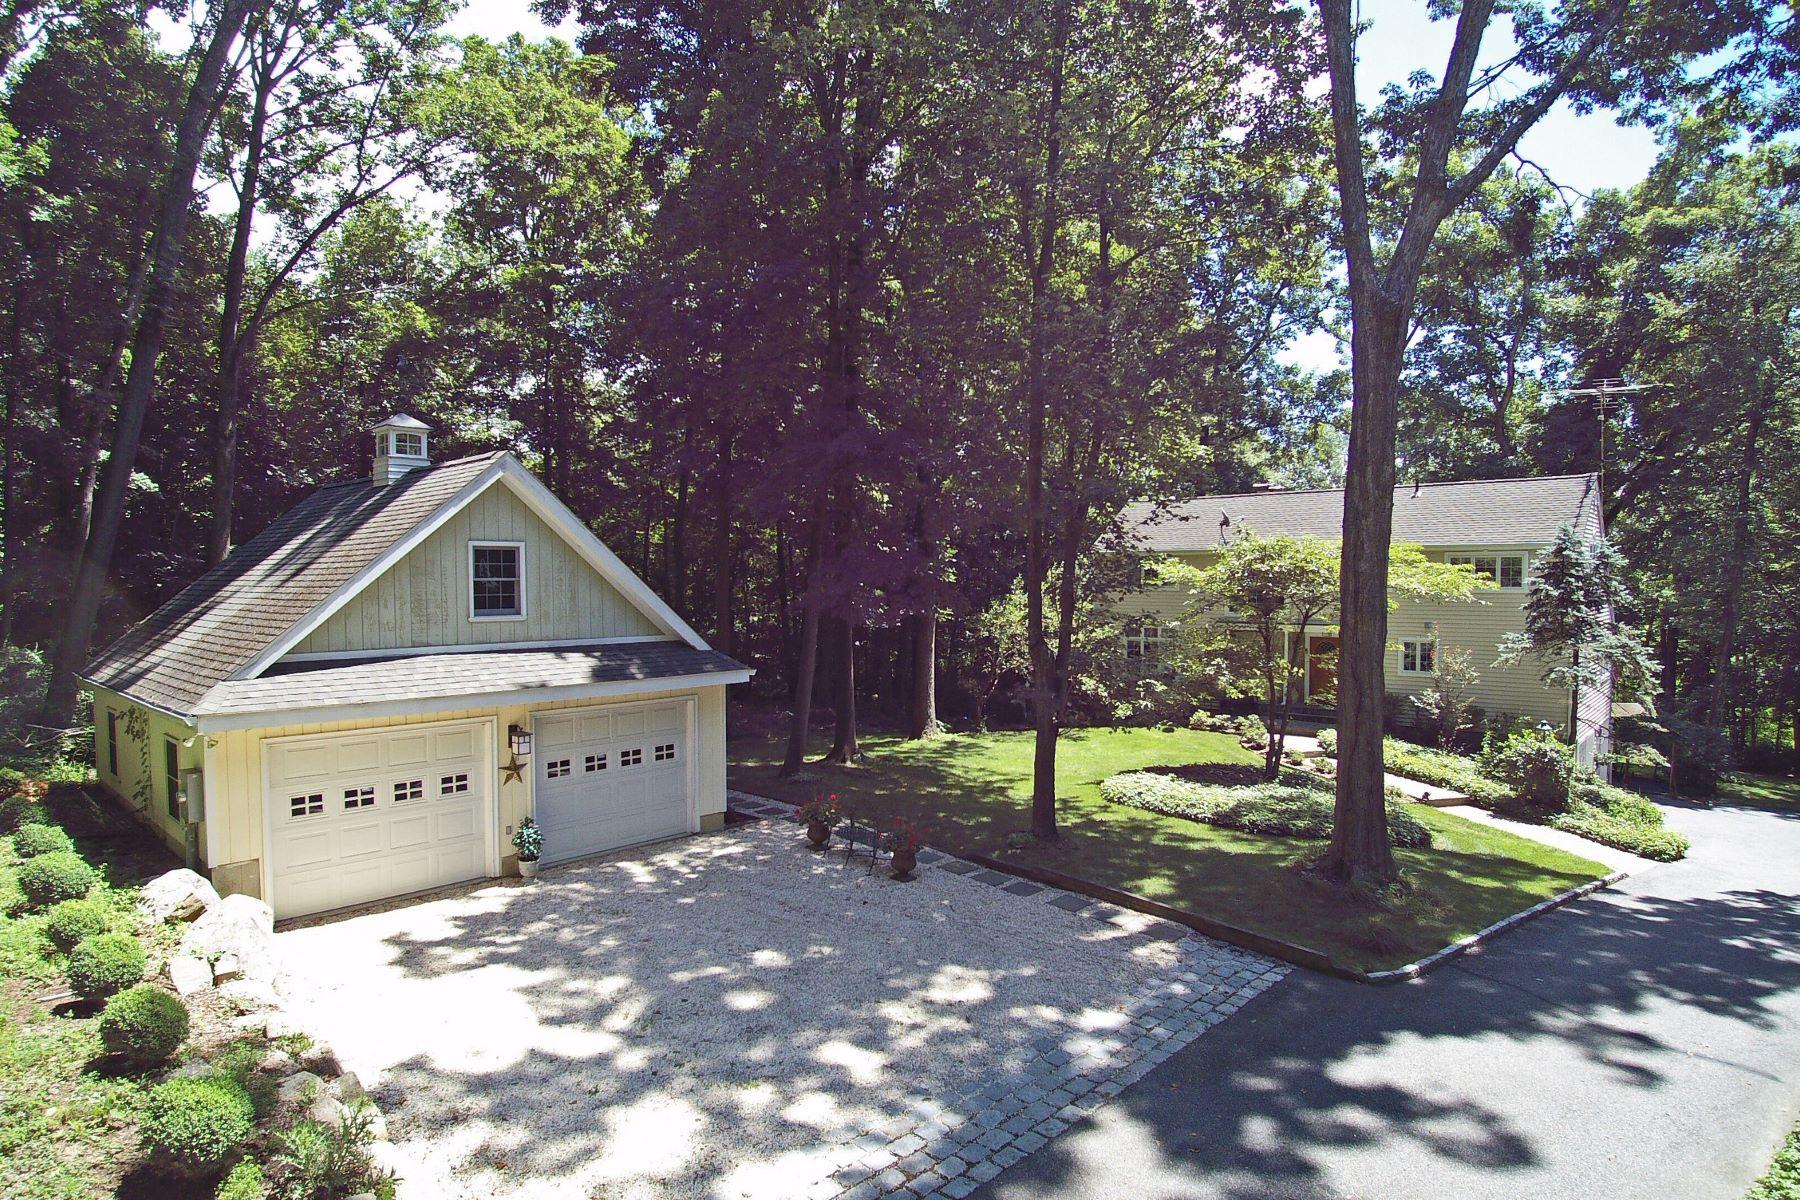 Single Family Homes για την Πώληση στο PICTURESQUE COLONIAL 344 Danbury Rd, Ridgefield, Κονεκτικατ 06877 Ηνωμένες Πολιτείες